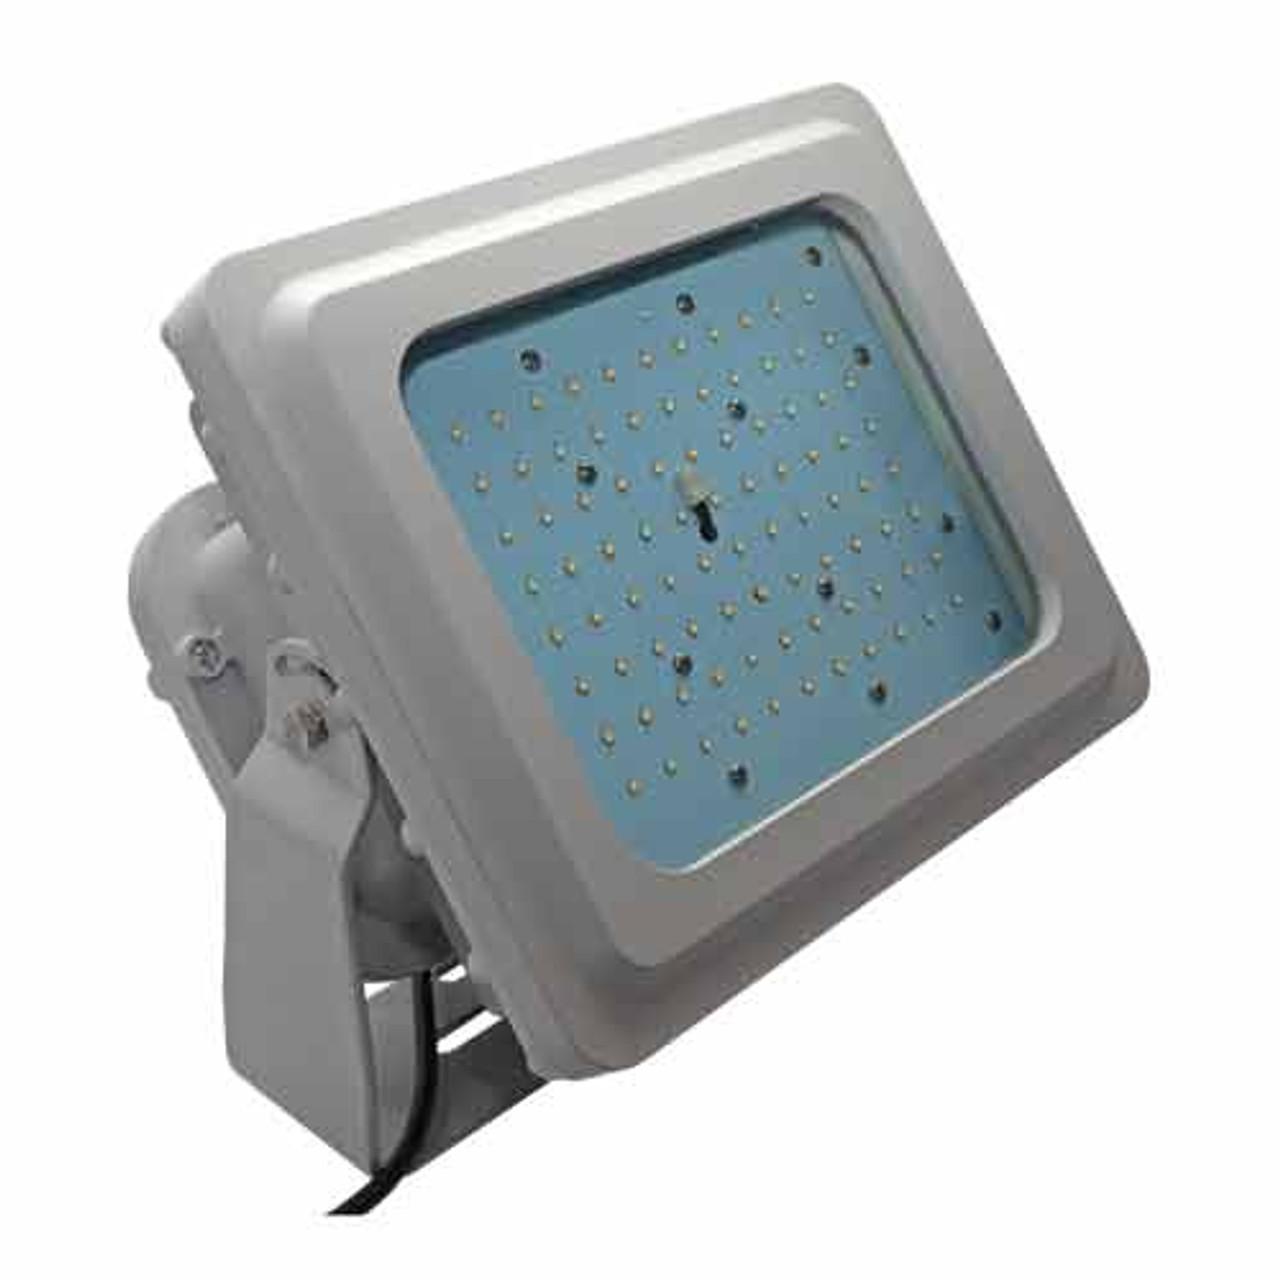 132 Watt LED Hazardous Location Explosion Proof Flood Light